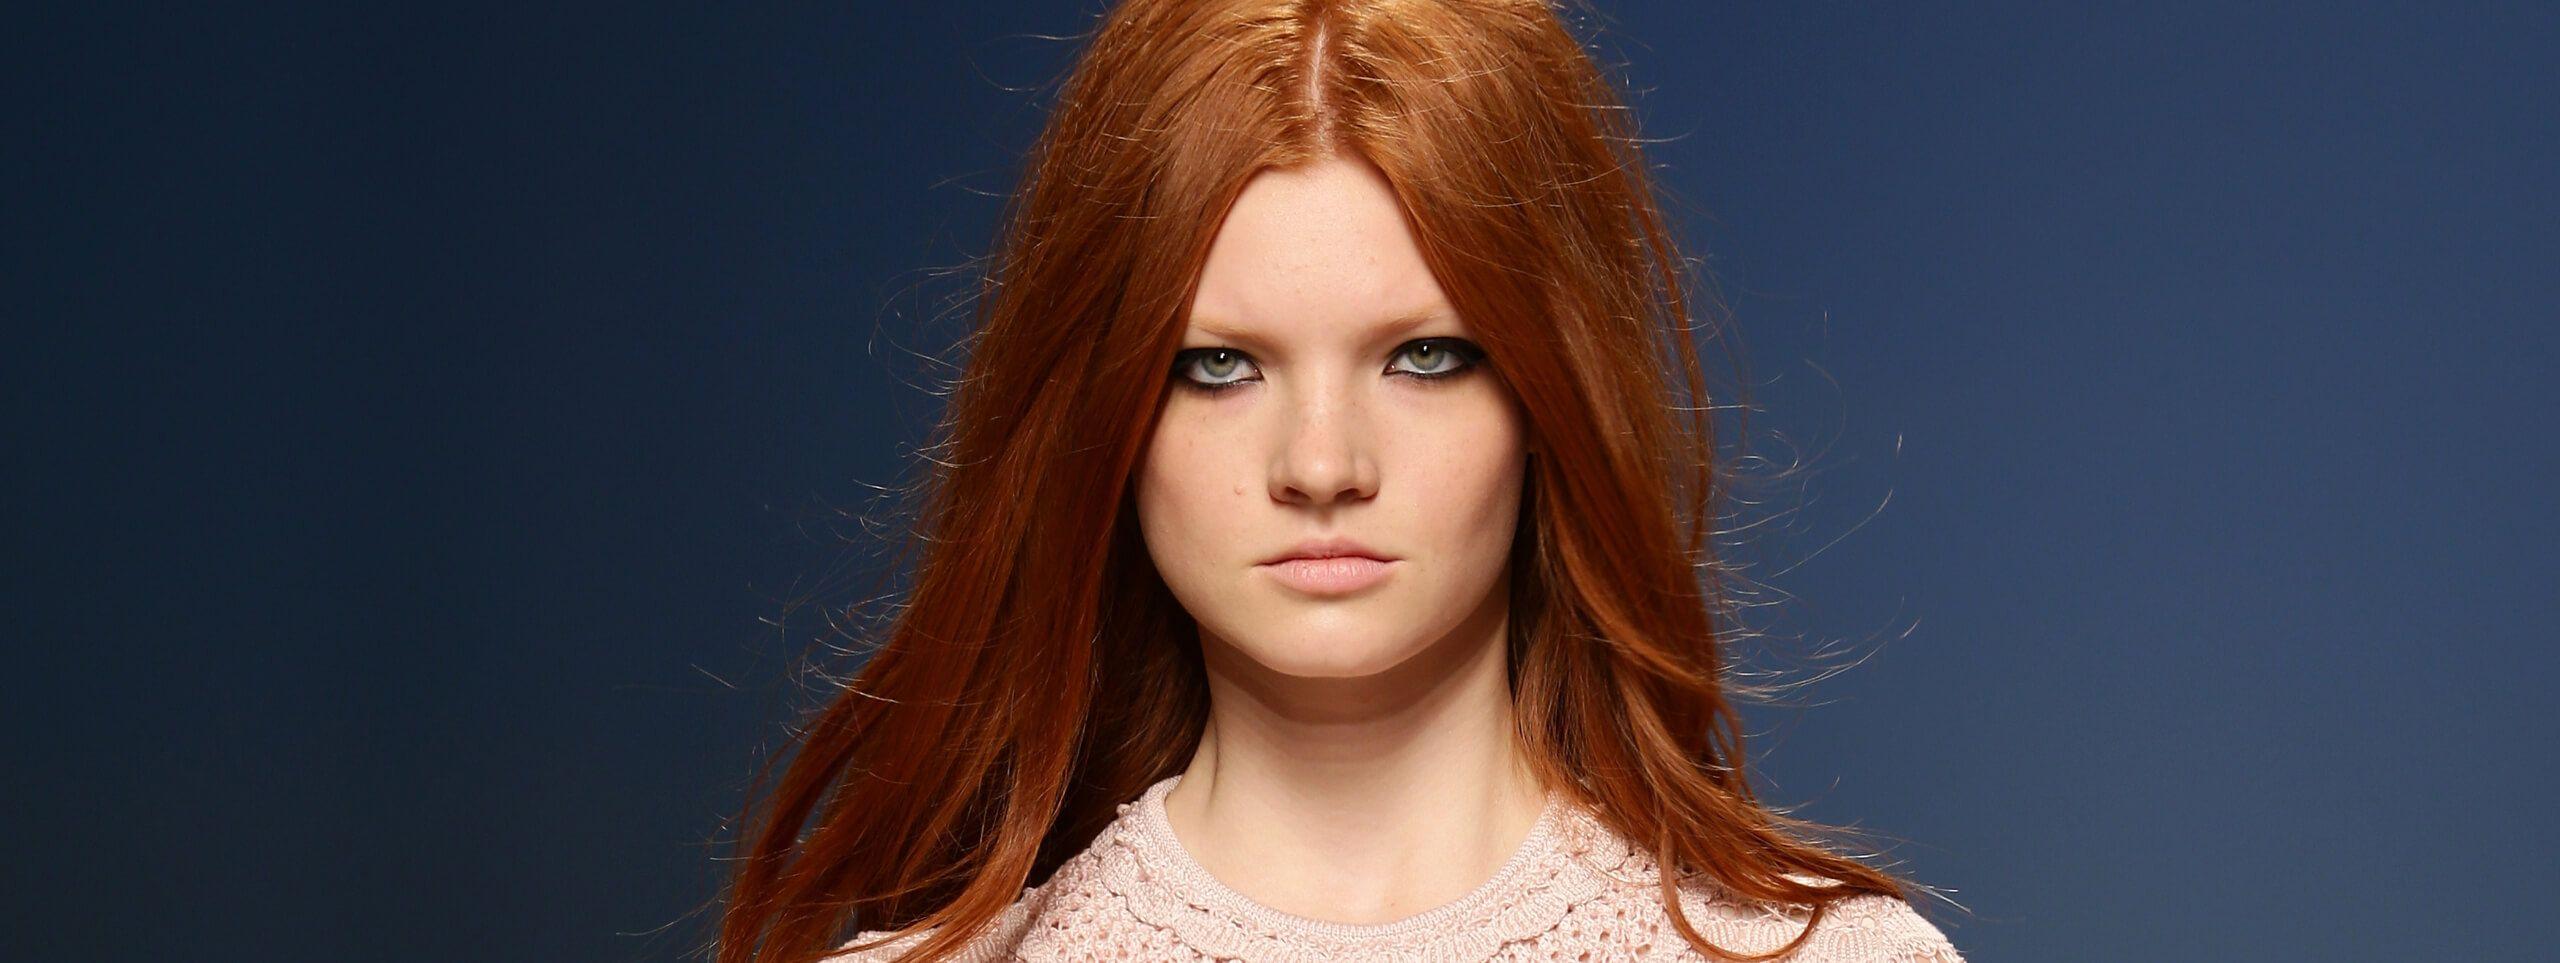 Model rocks warm hair color trend